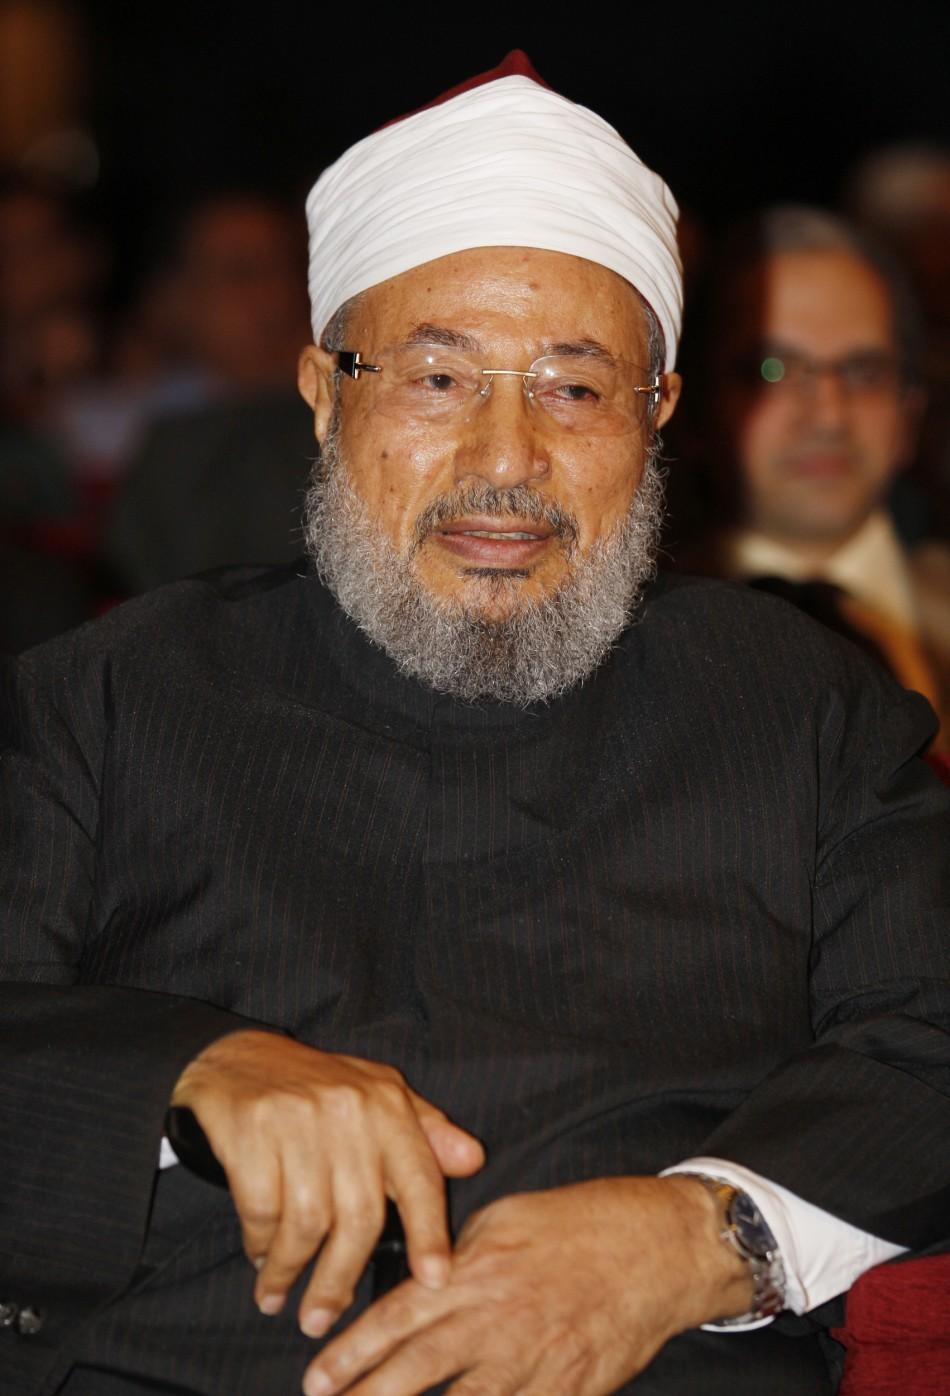 Egyptian-born cleric Sheikh Yussef al-Qaradawi attends a forum in Doha